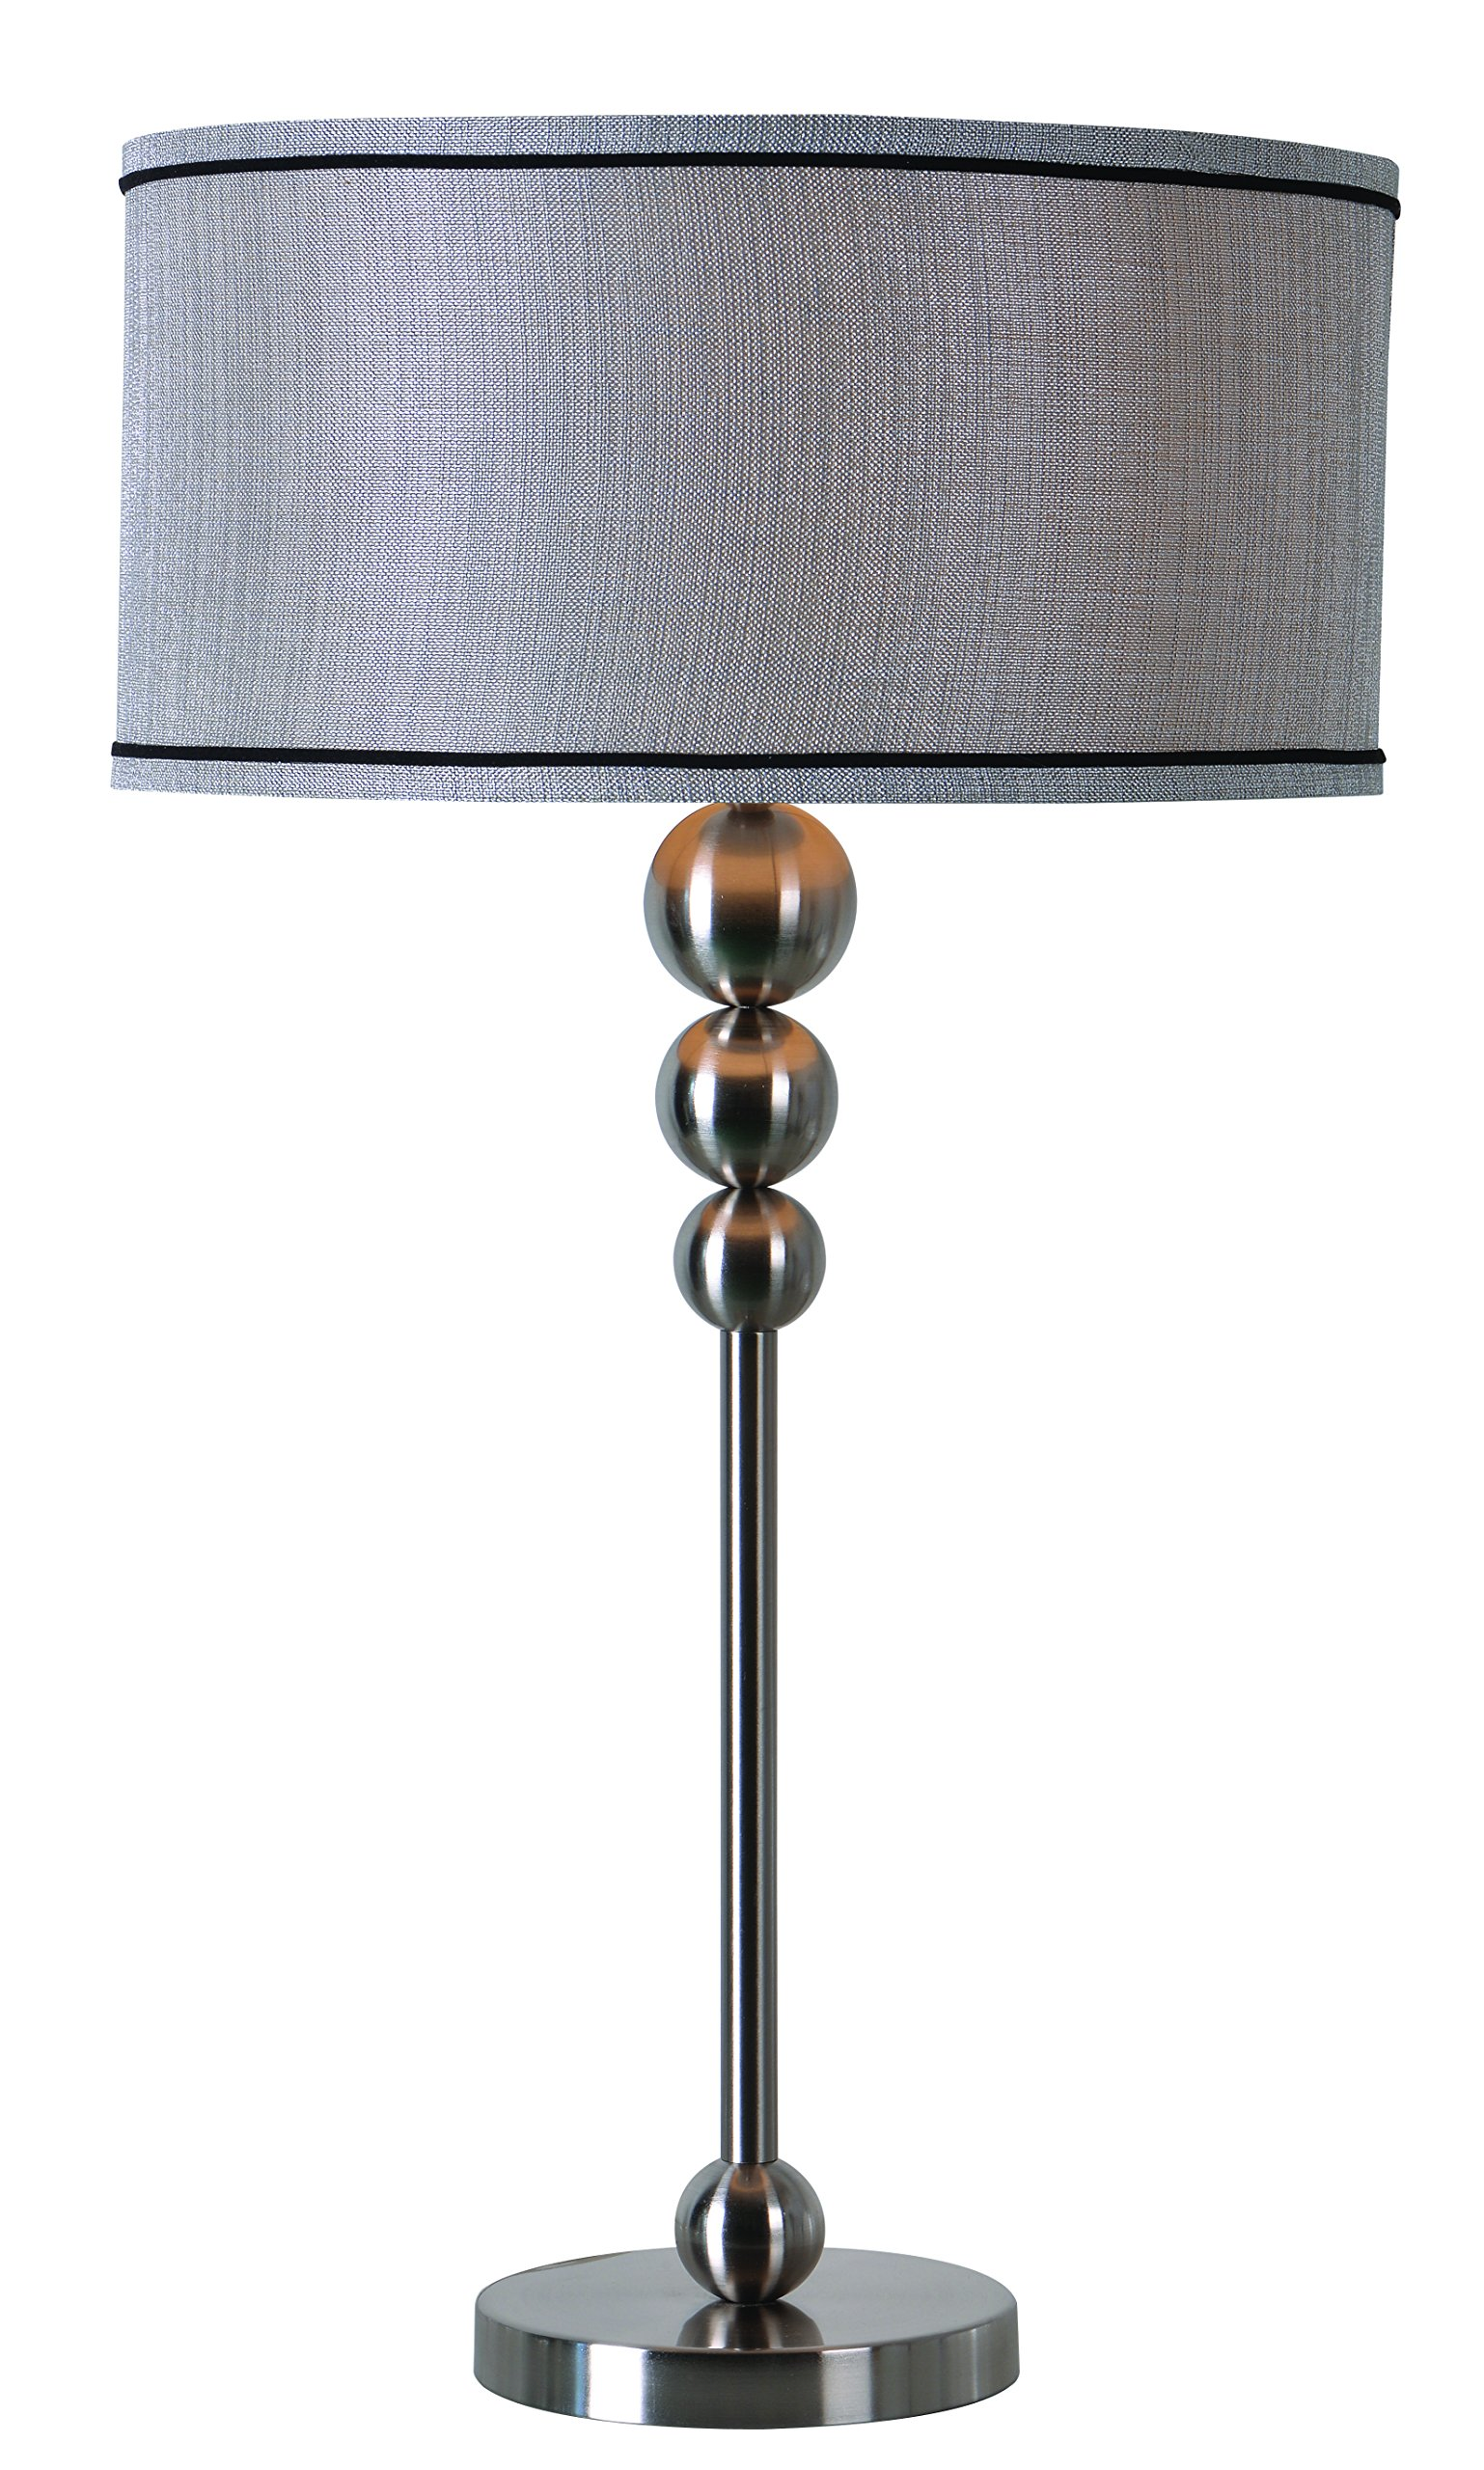 Kenroy Home Margot Table Lamp, Brushed Steel Finish